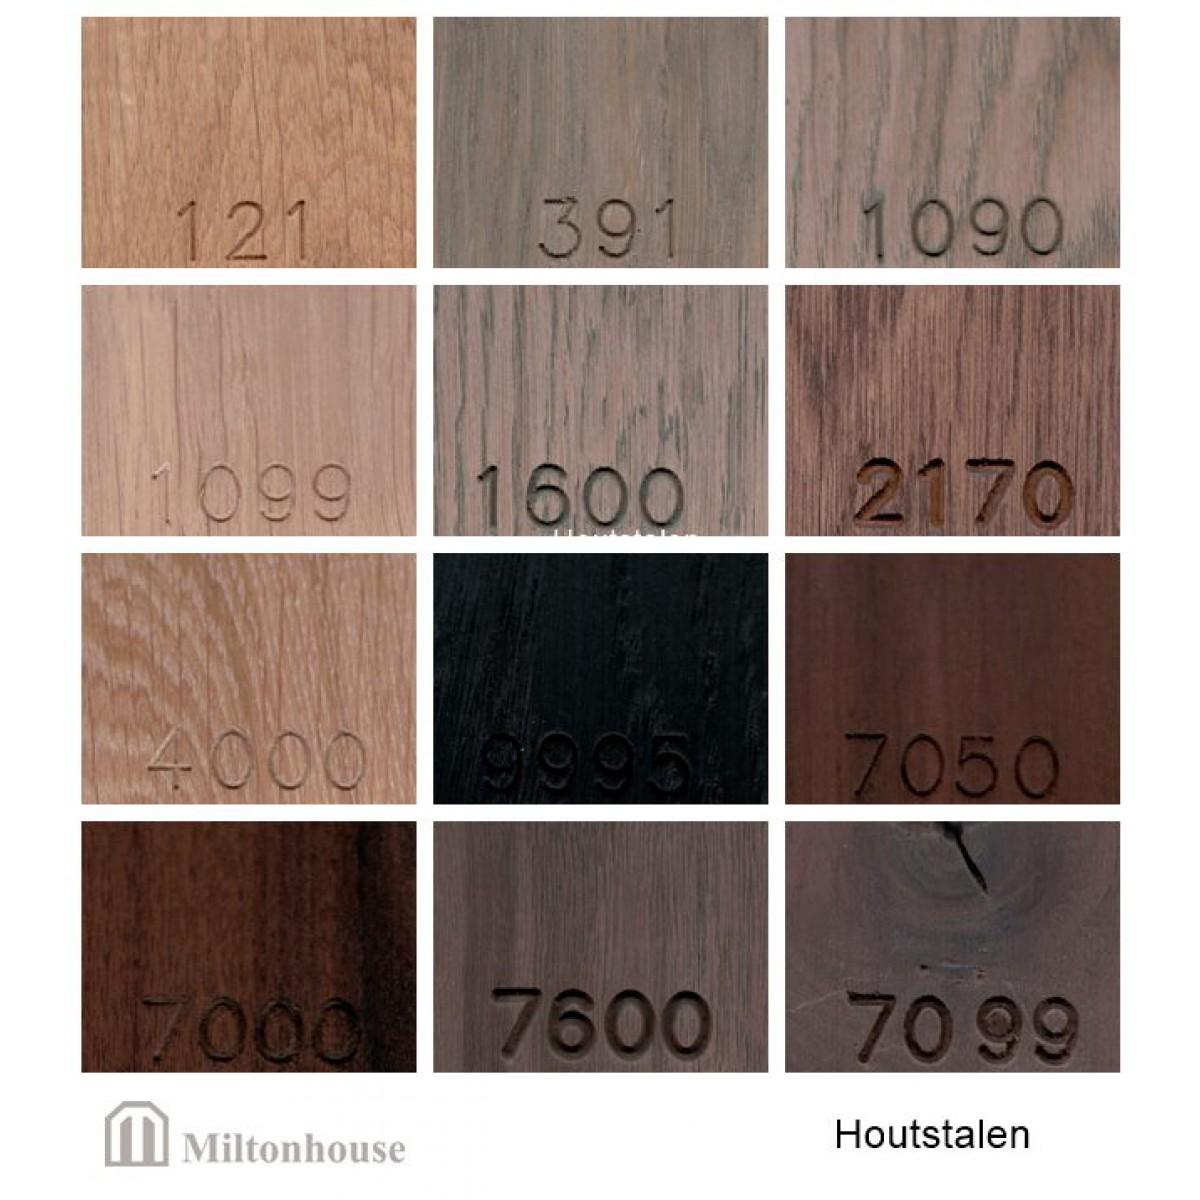 houtstalen-cloud-probilex-miltonhouse